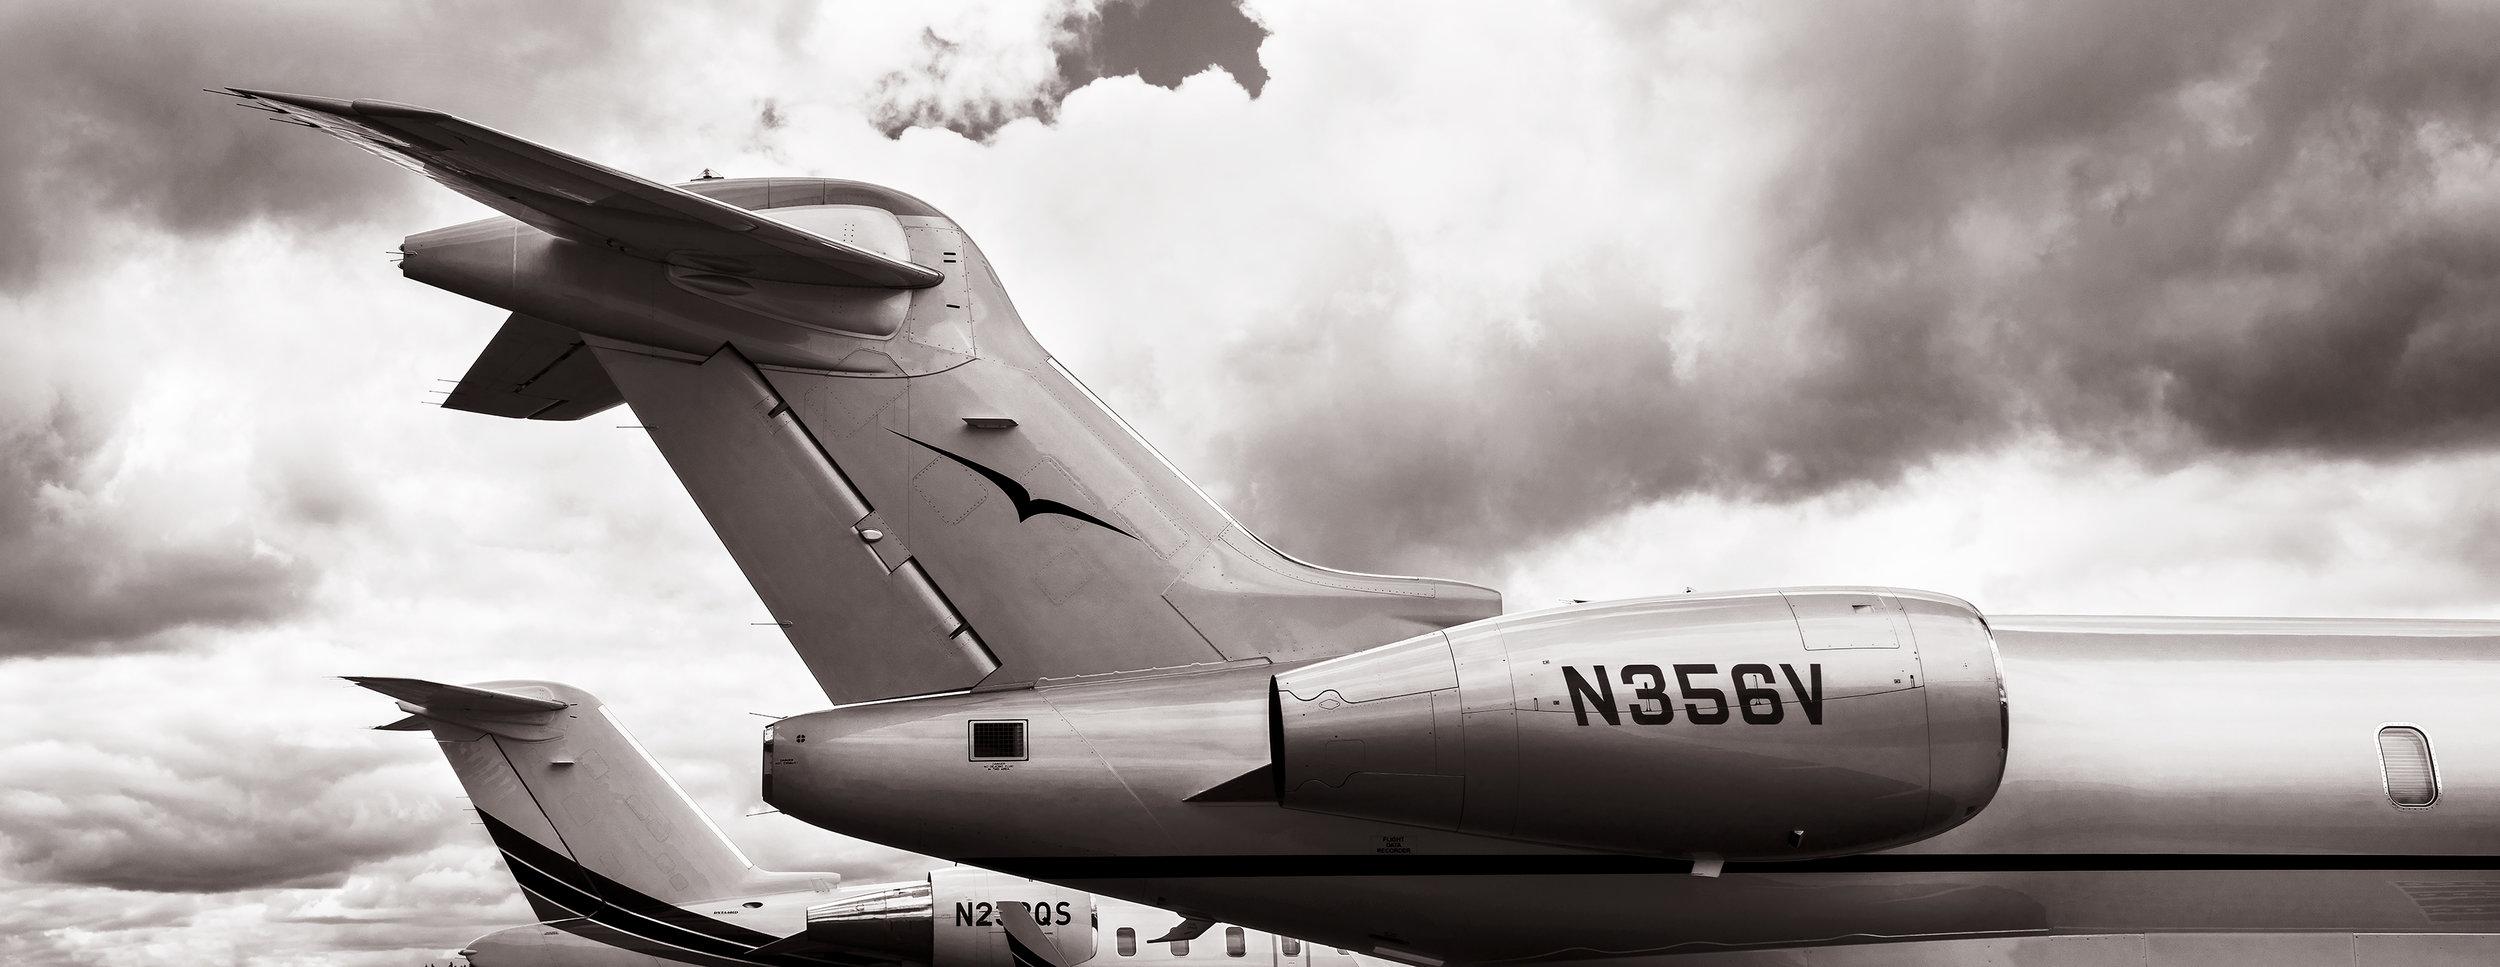 _DSC3943_Jet Engine_web ready.jpg